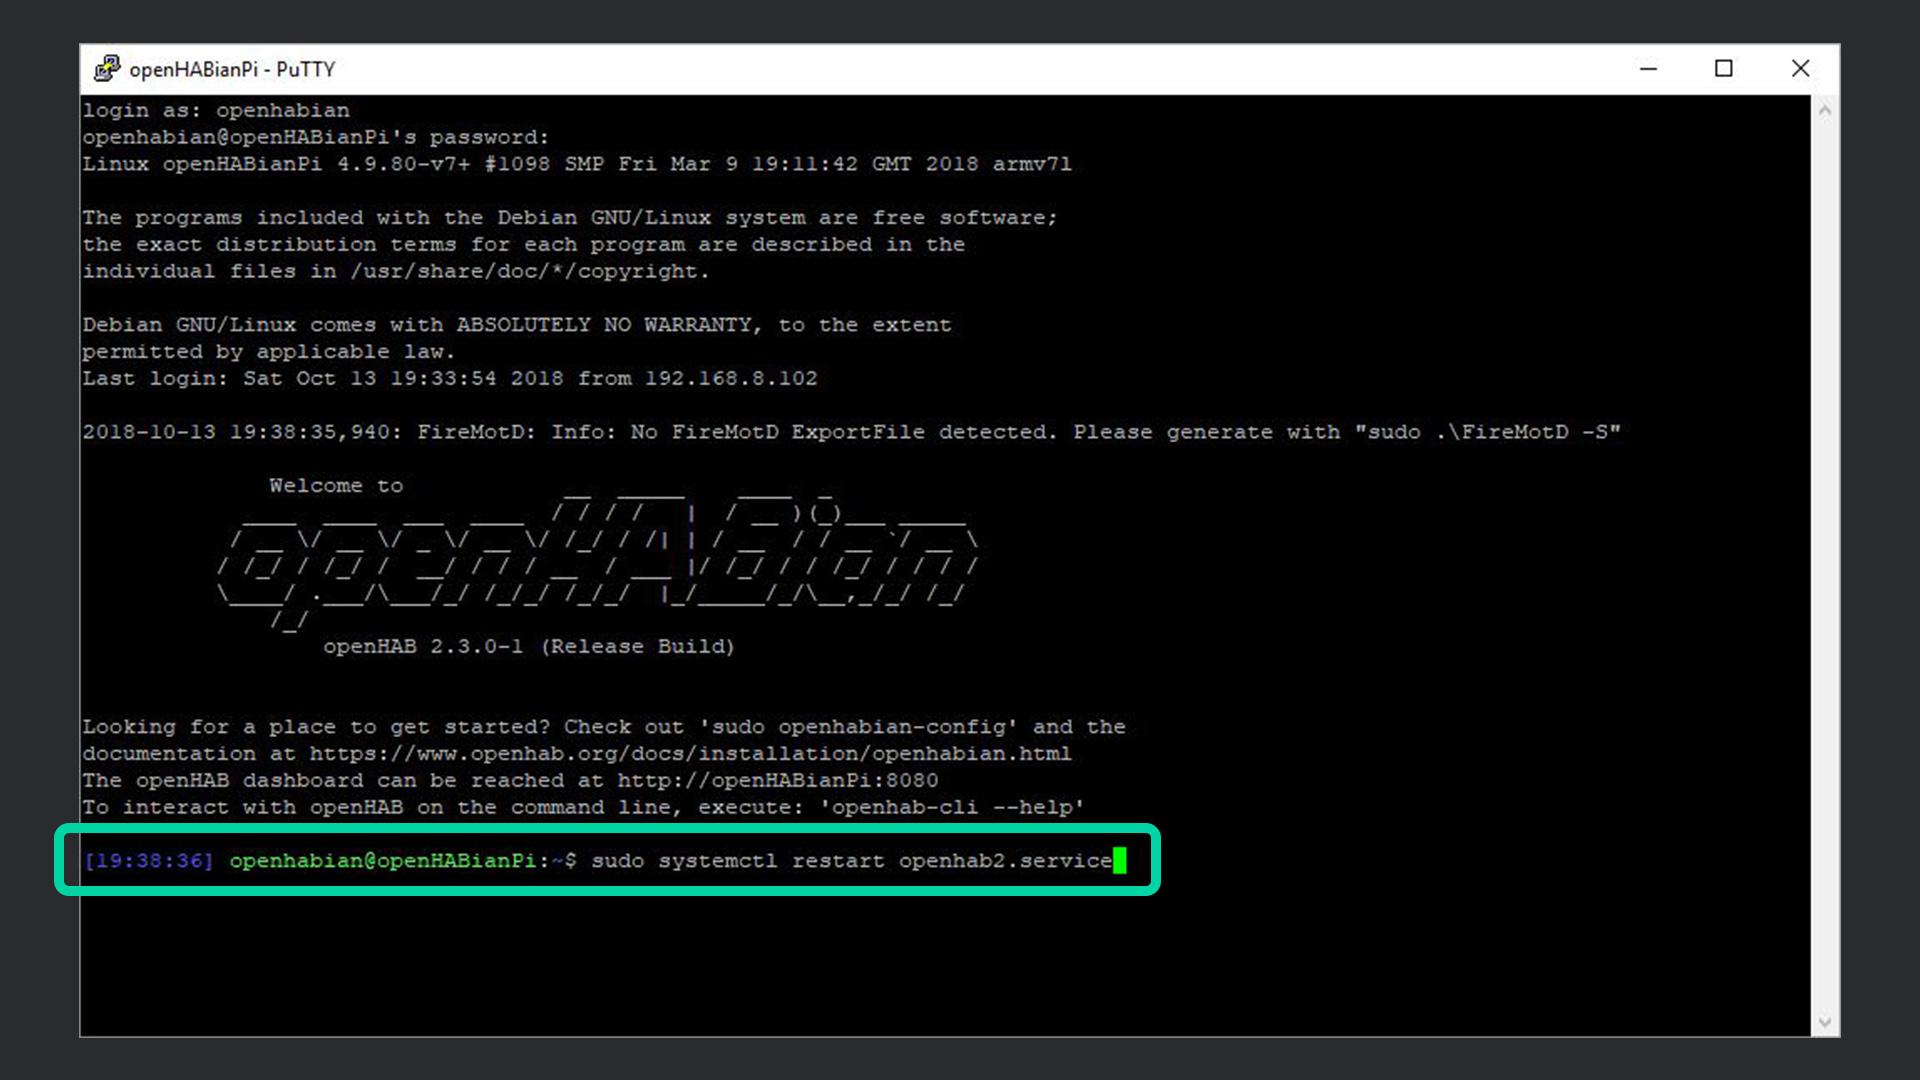 DigitaleWelt openHAB 2 - openHABian restart